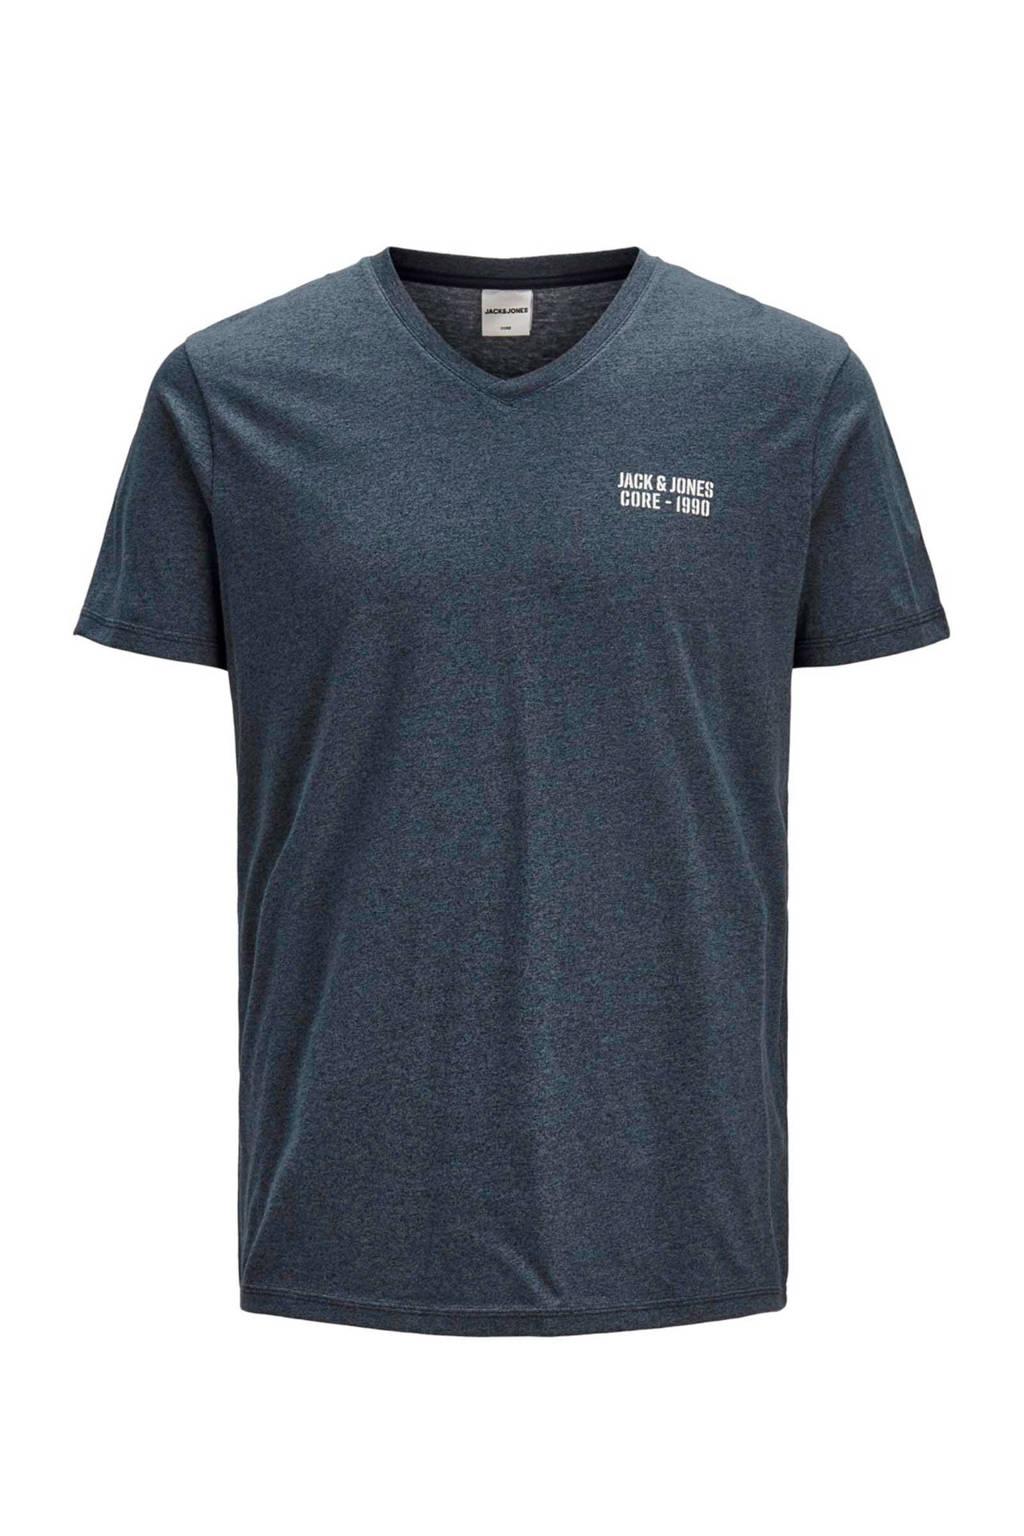 JACK & JONES CORE gemêleerd T-shirt donkerblauw, Donkerblauw